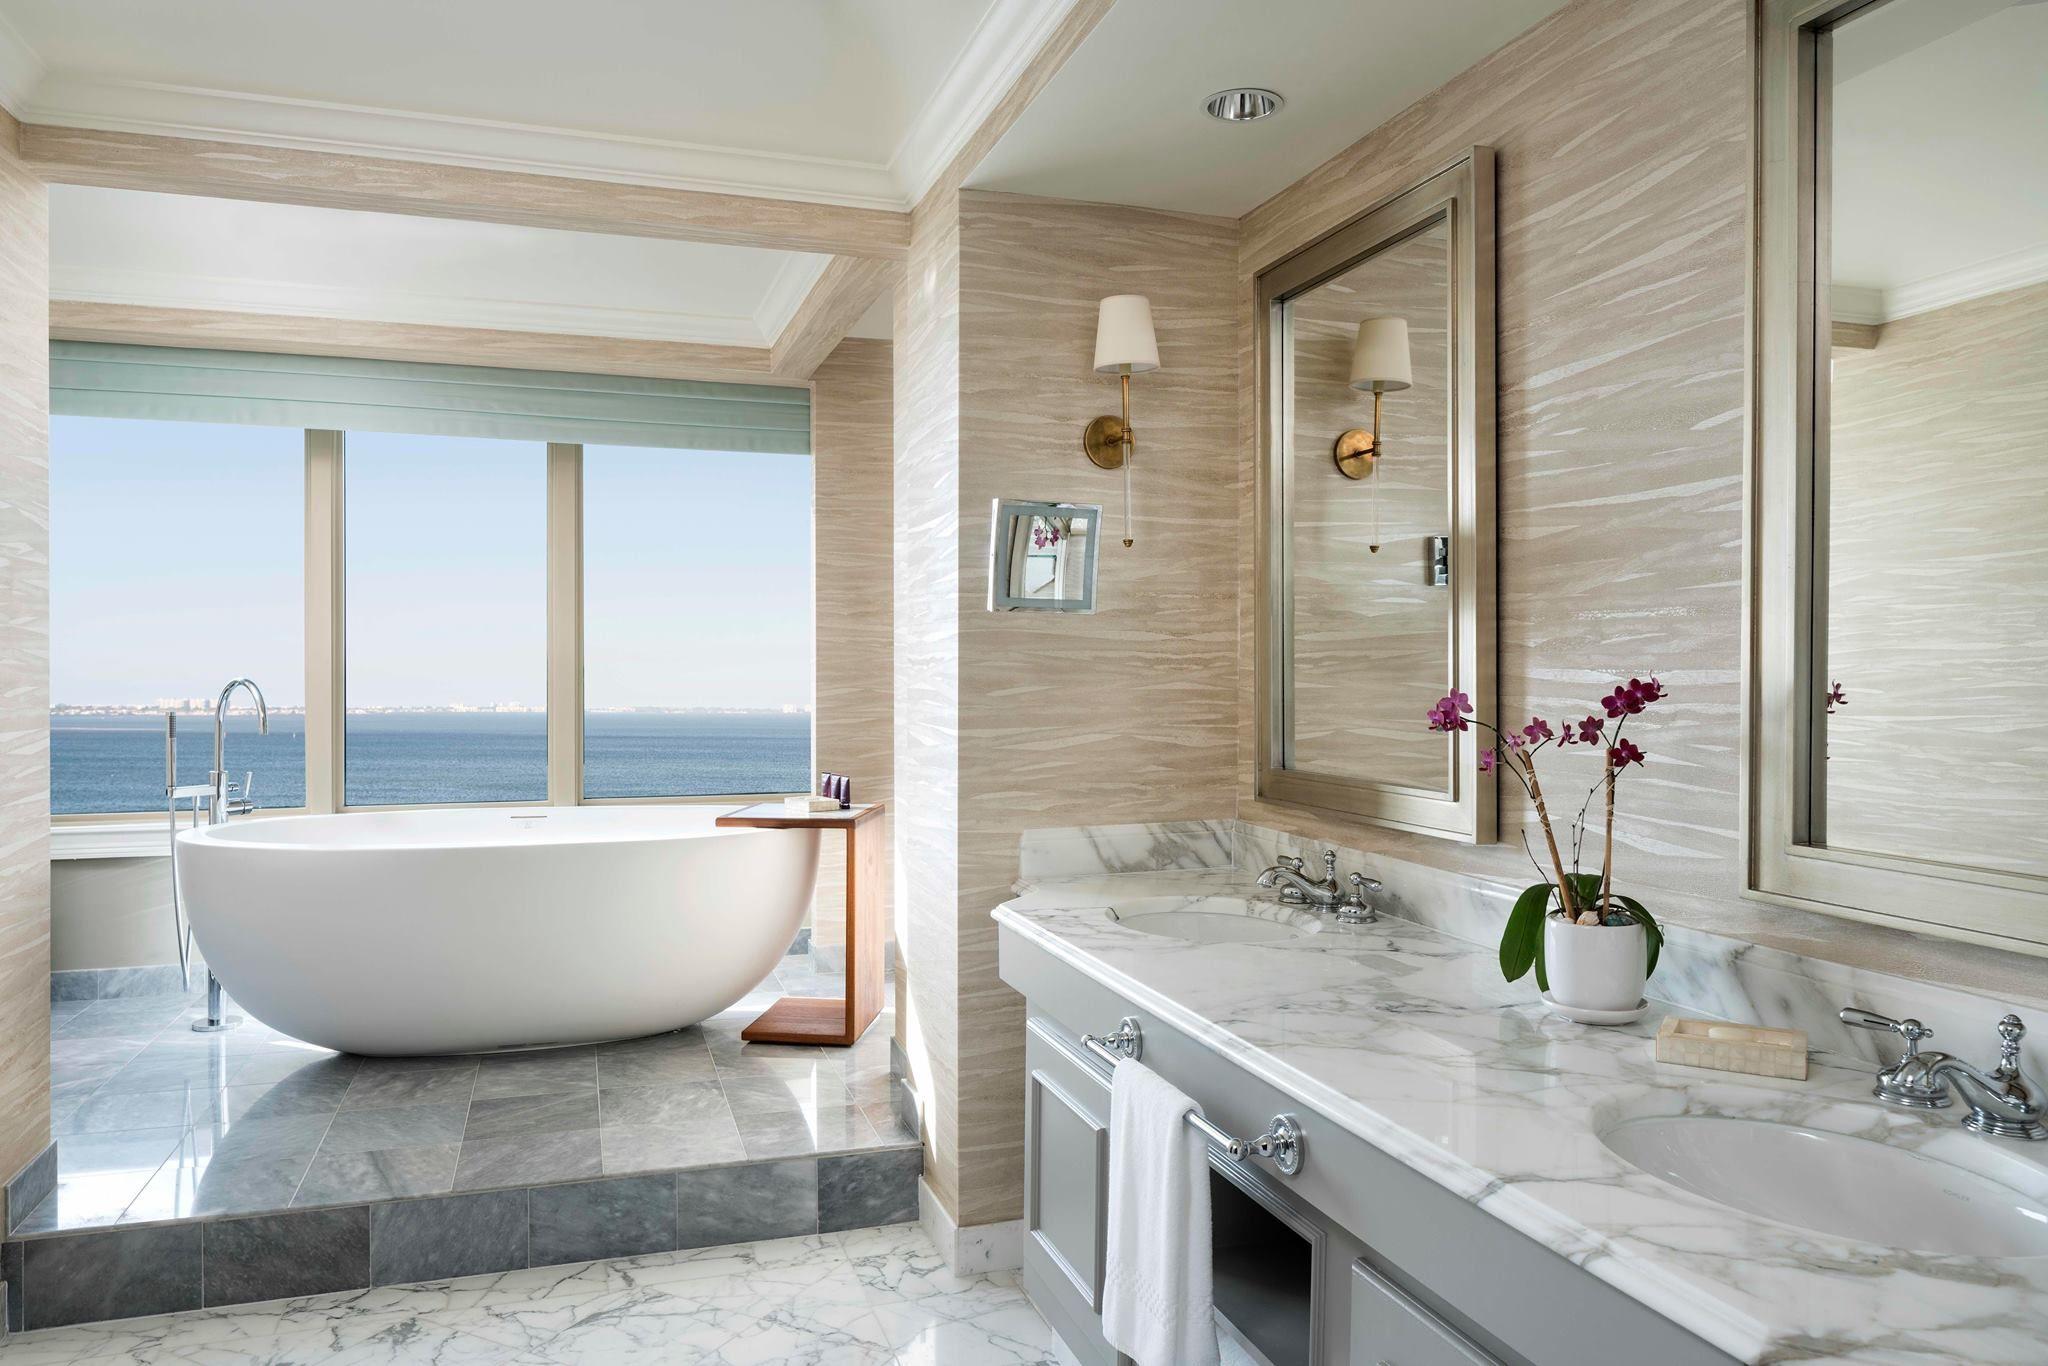 Our freestanding luxury designer bathtubs soaker tubs